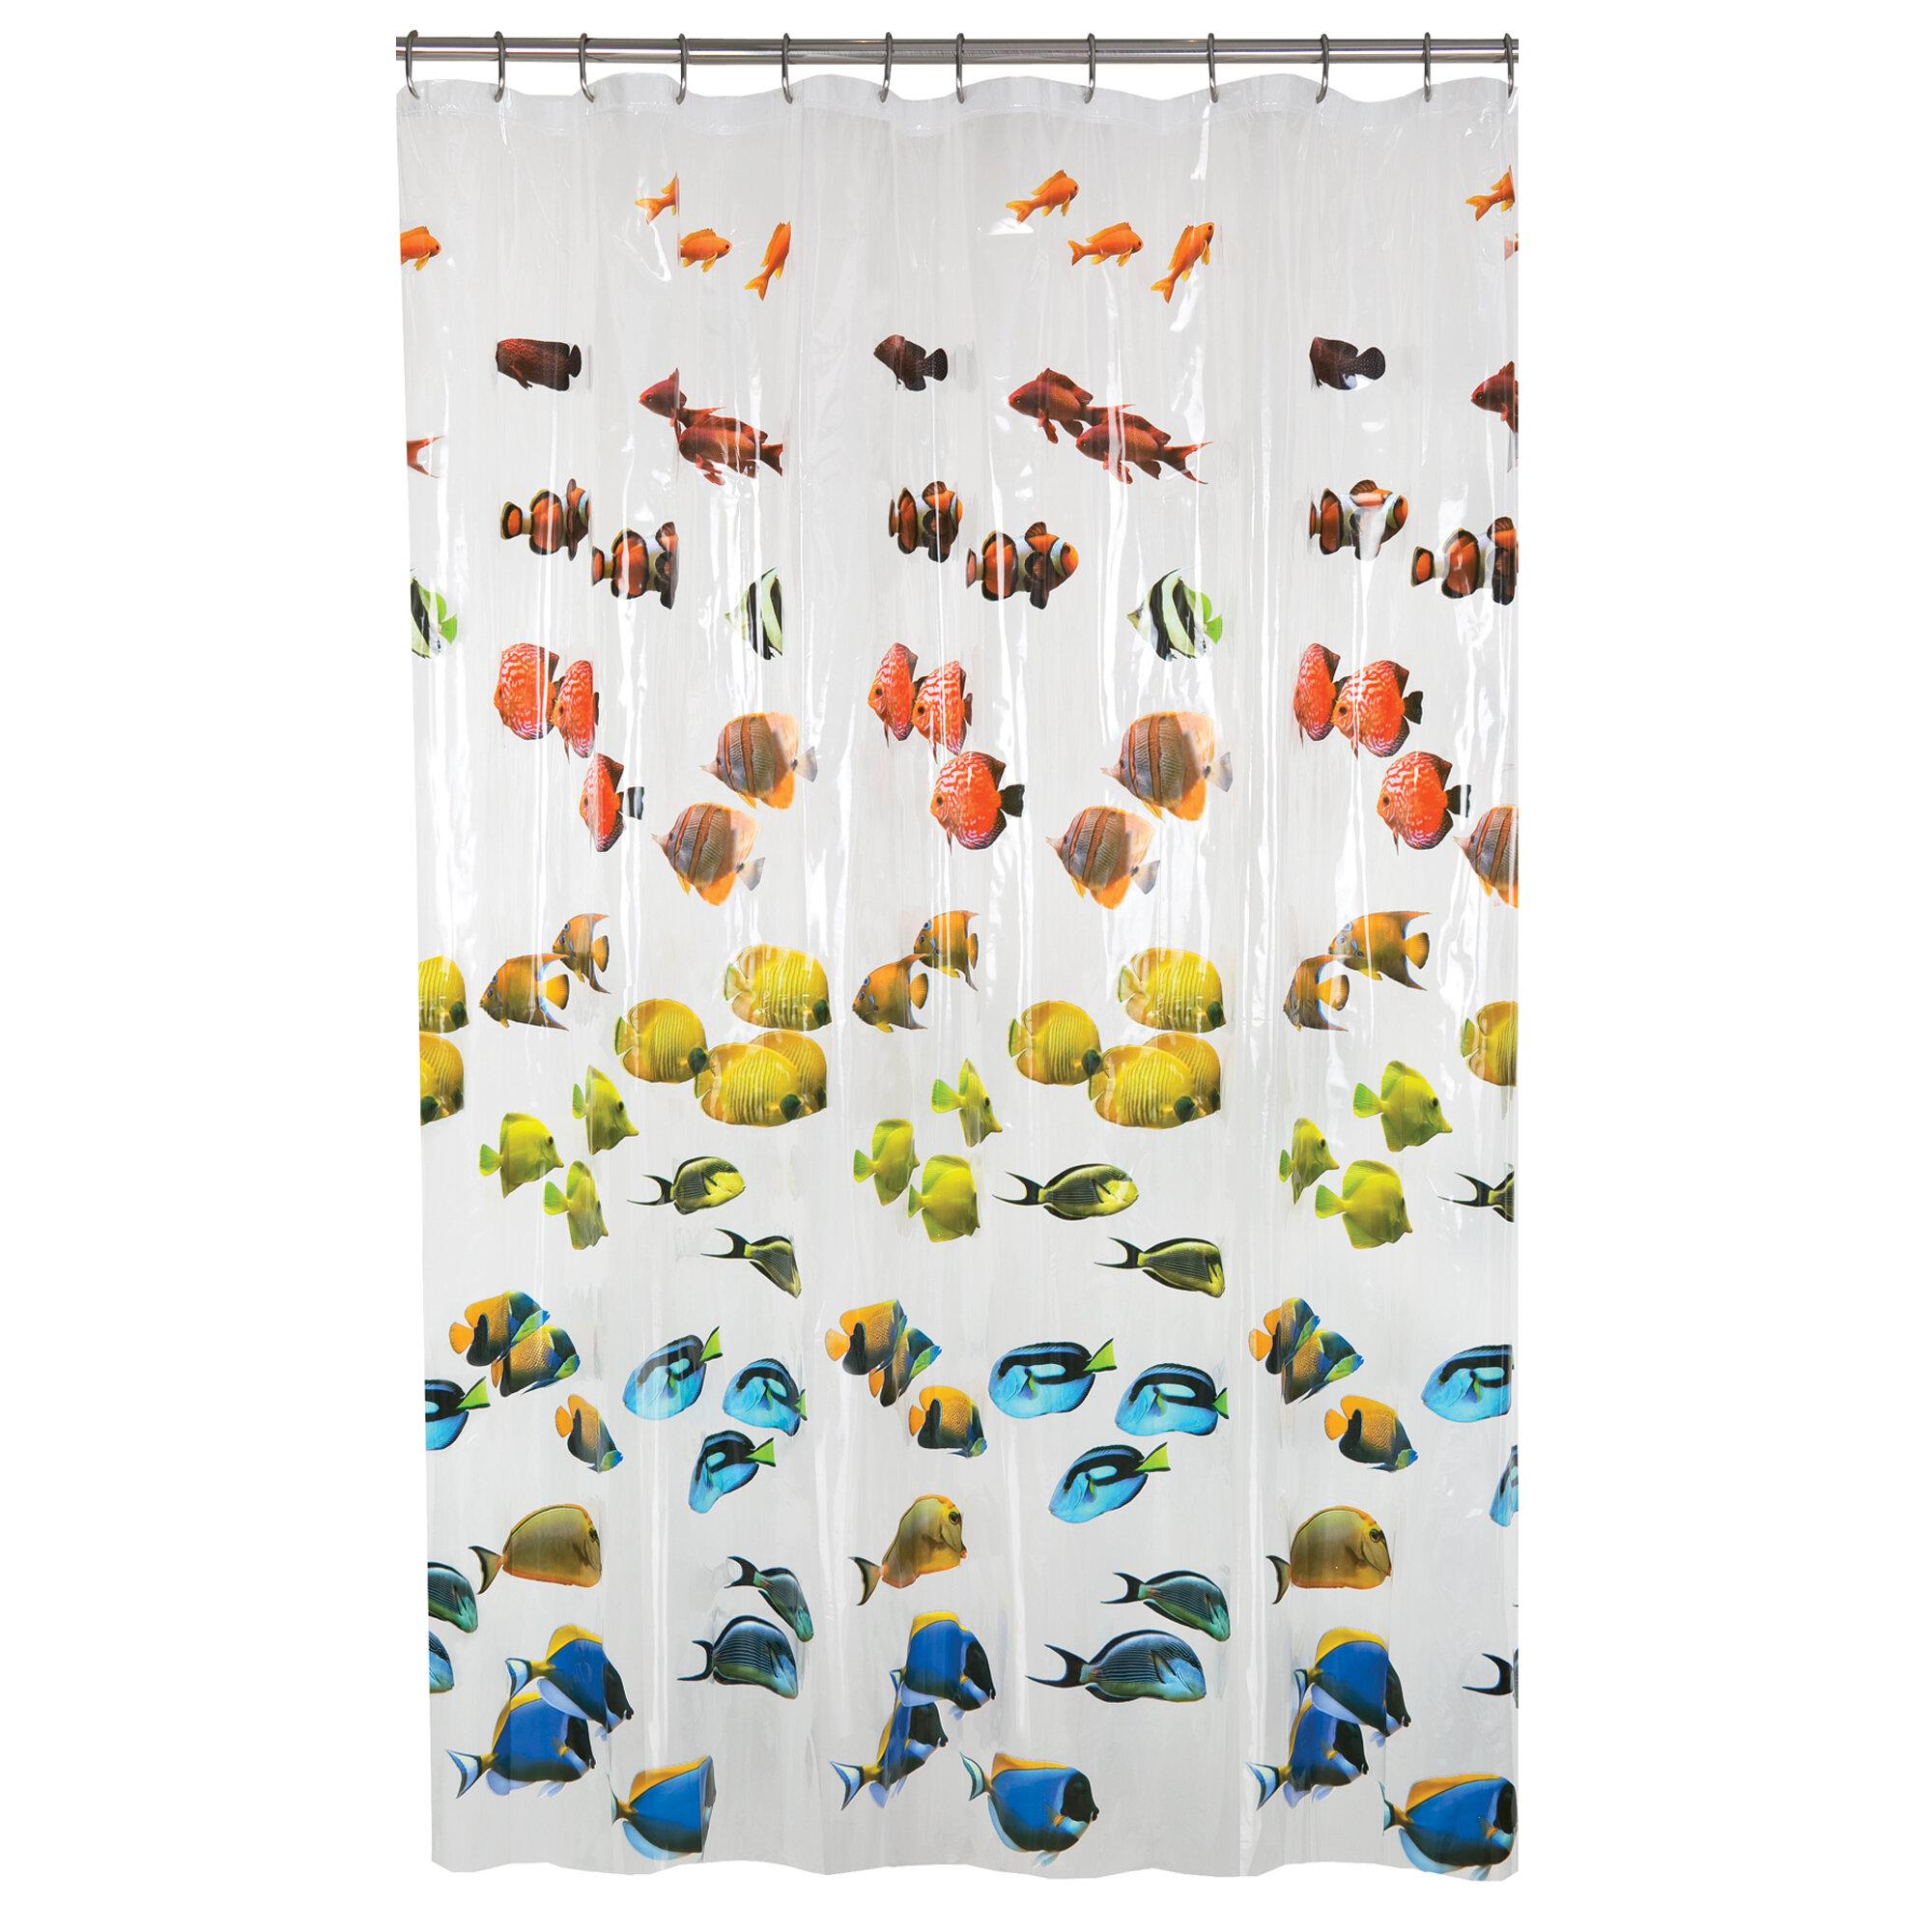 Zoomie Kids Swansea Photoreal New School Fish Single Shower Curtain Reviews Wayfair